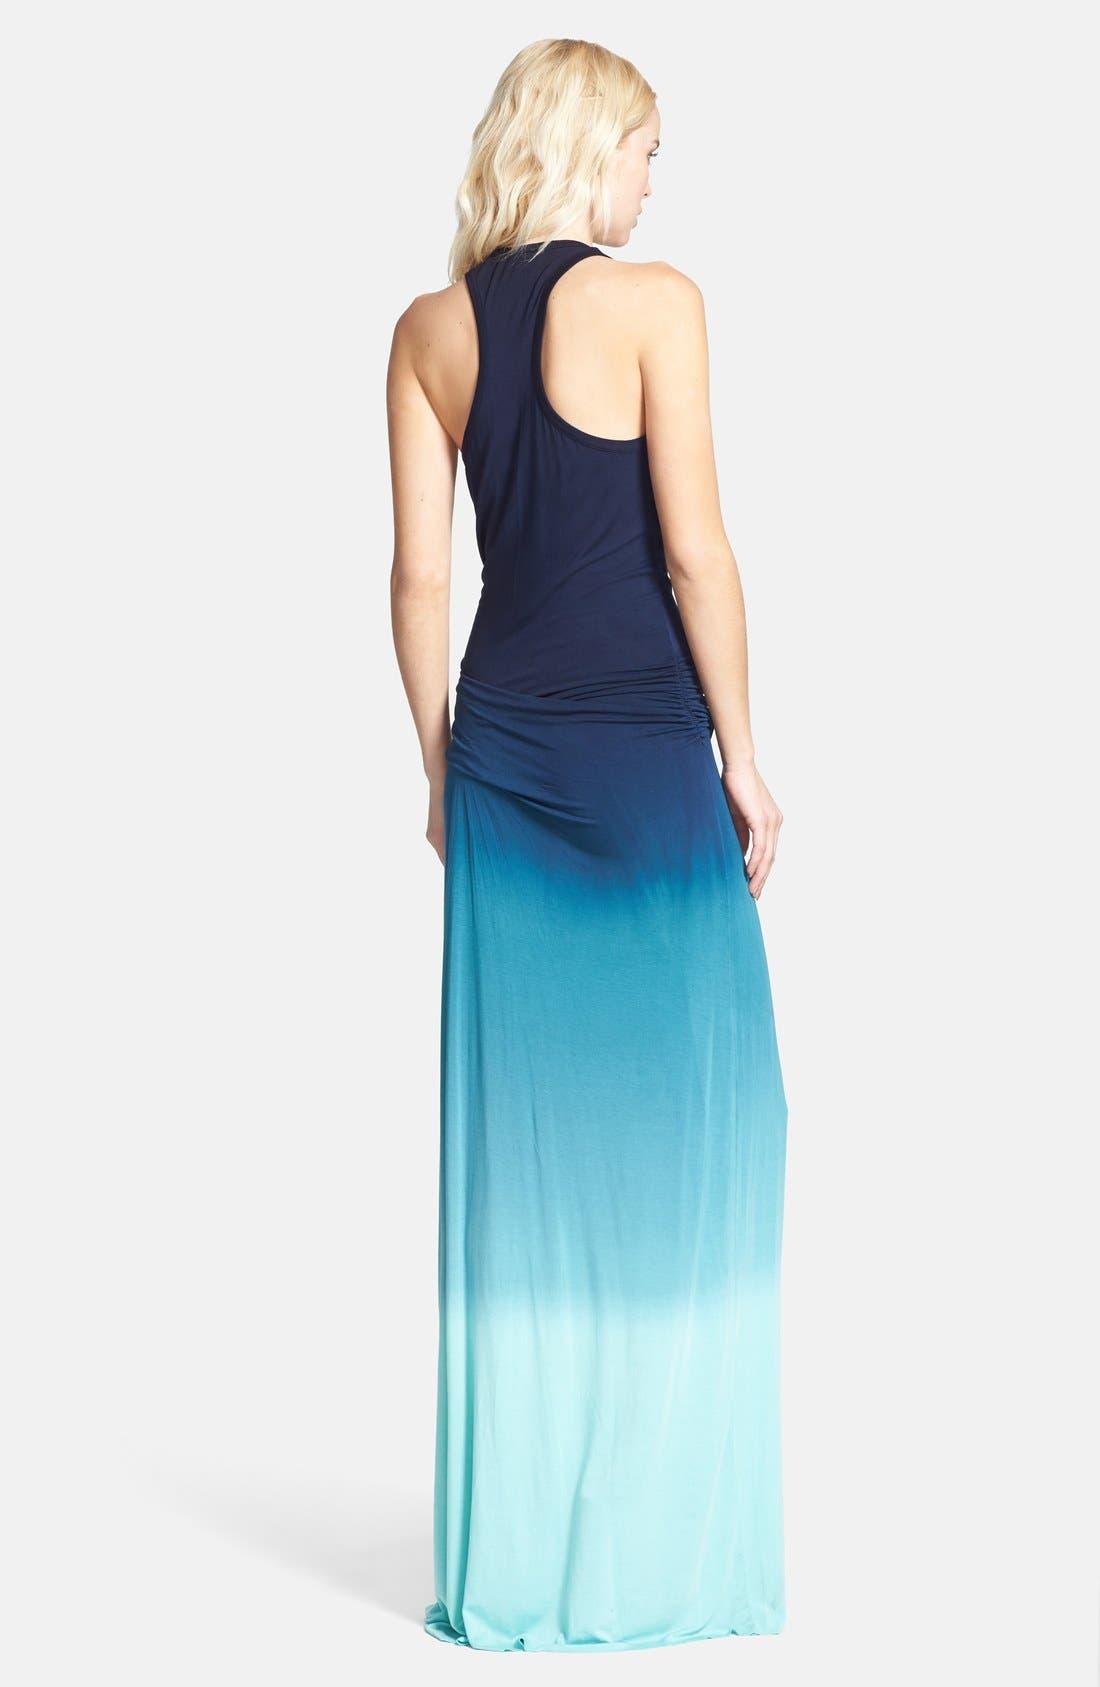 Alternate Image 2  - Young, Fabulous & Broke 'Hamptons' Racerback Jersey Maxi Dress